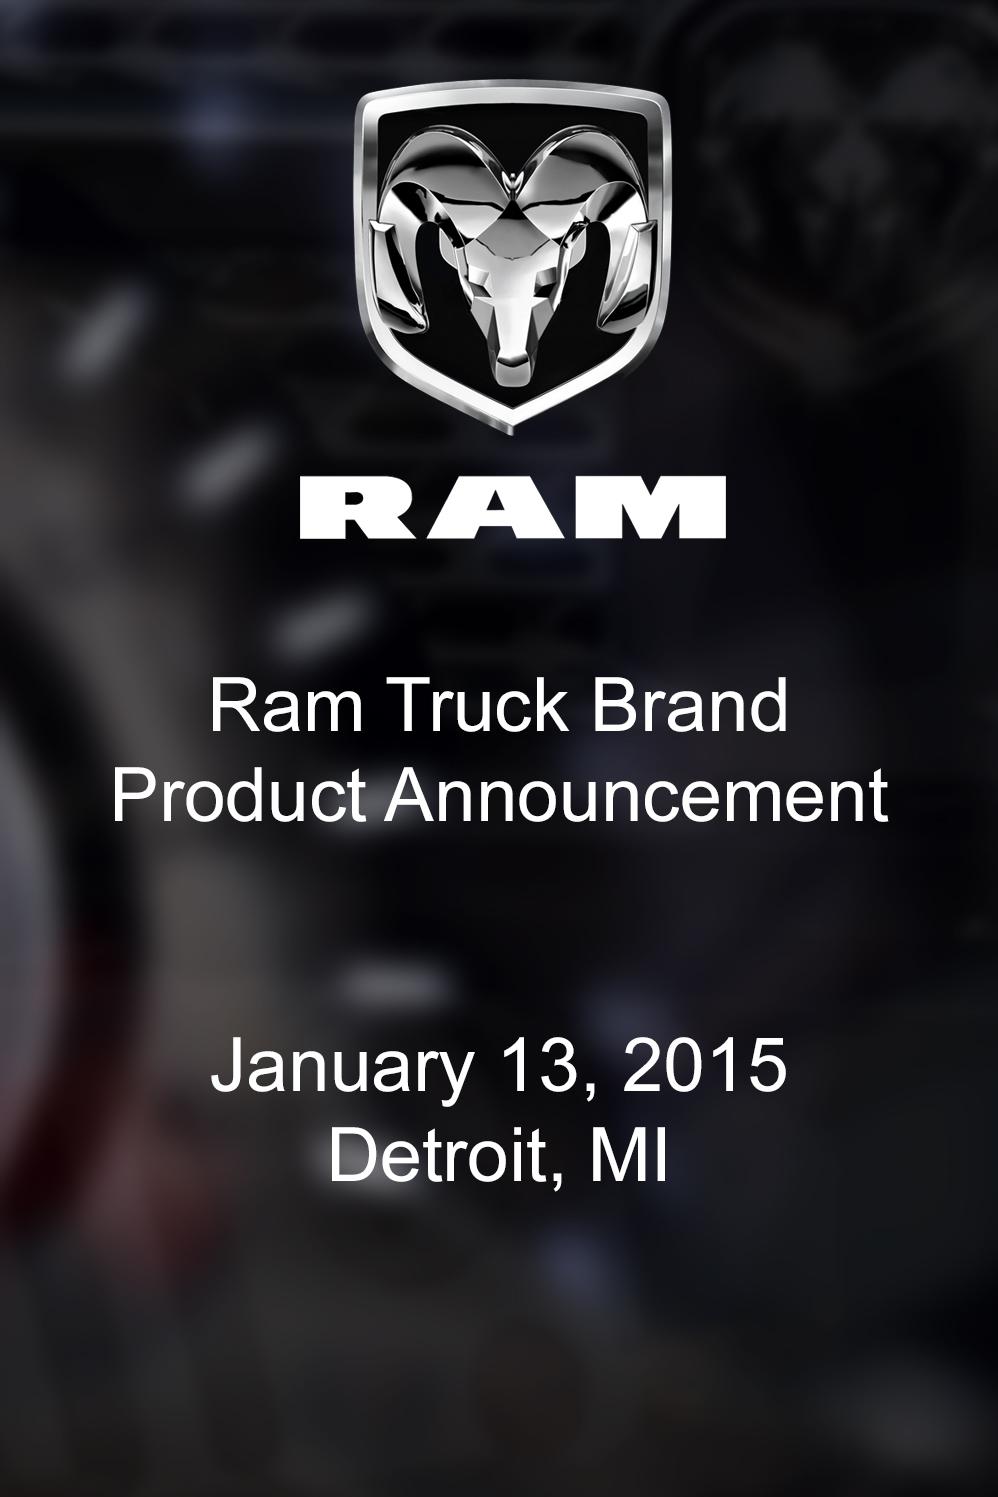 Ram Truck Brand Product Announcement On Livestream